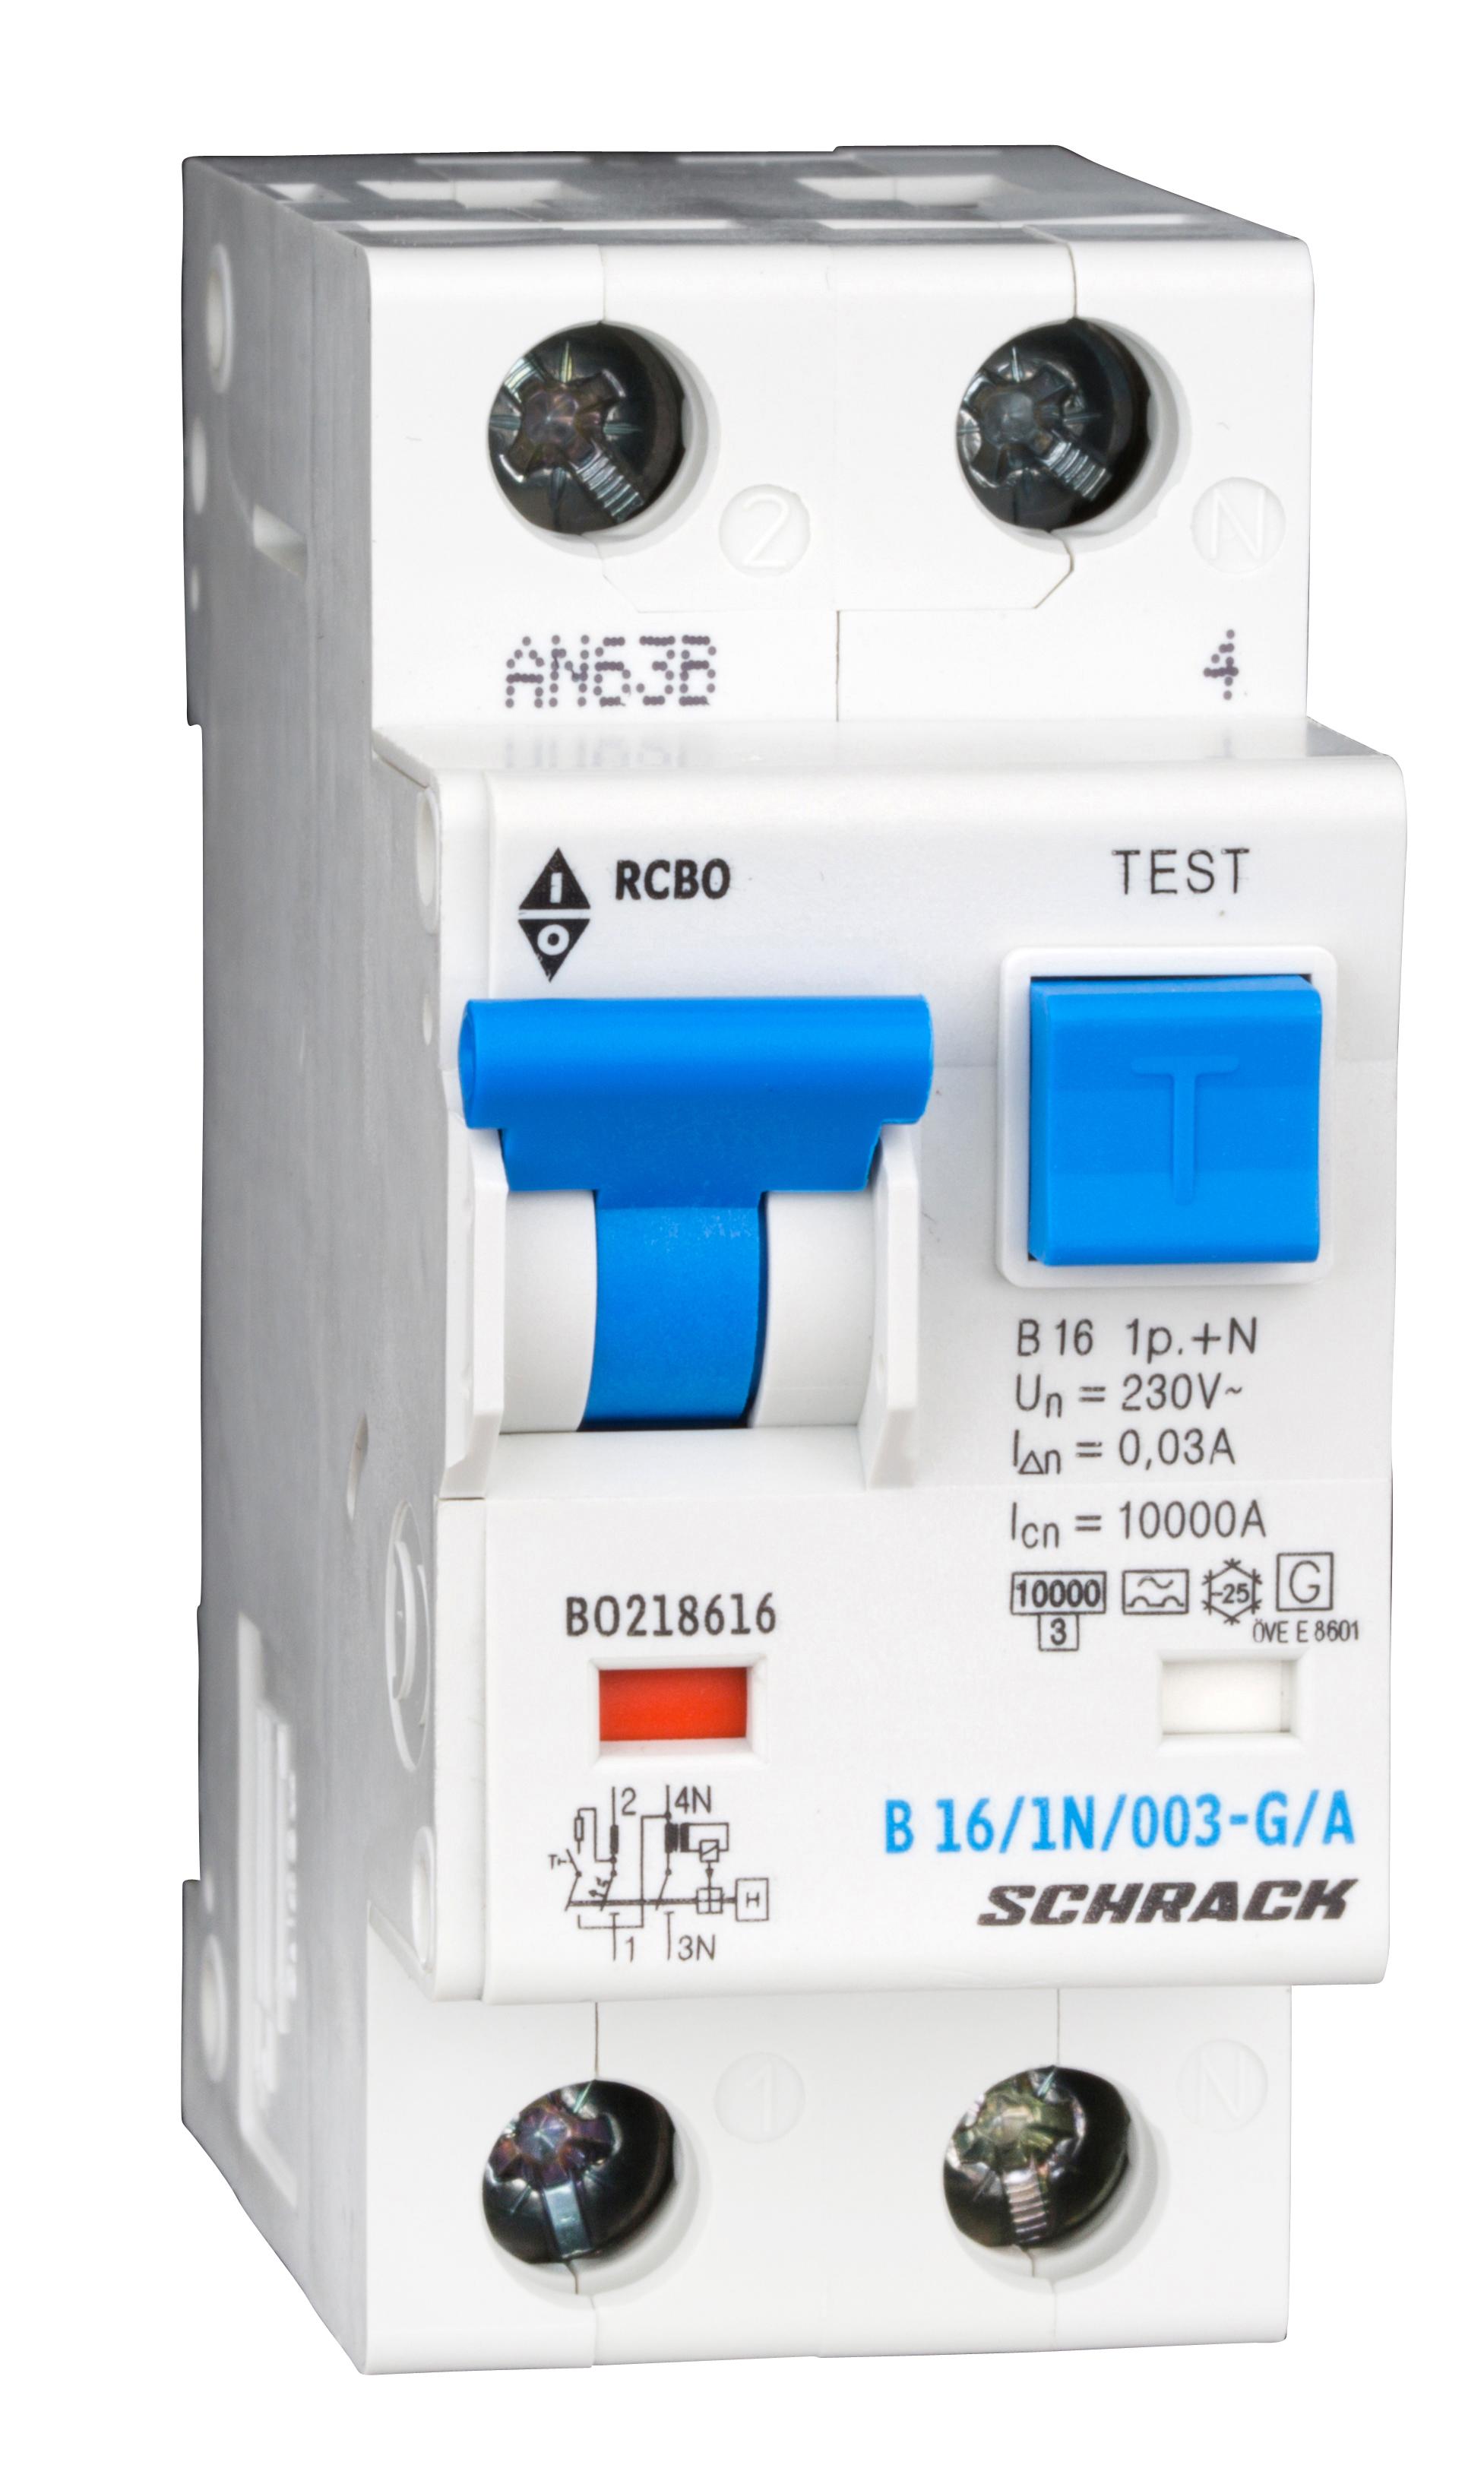 1 Stk LS-FI-Schalter,Kennl. B,16A,30mA,1-polig+N, Bauart G,Typ A BO218616--